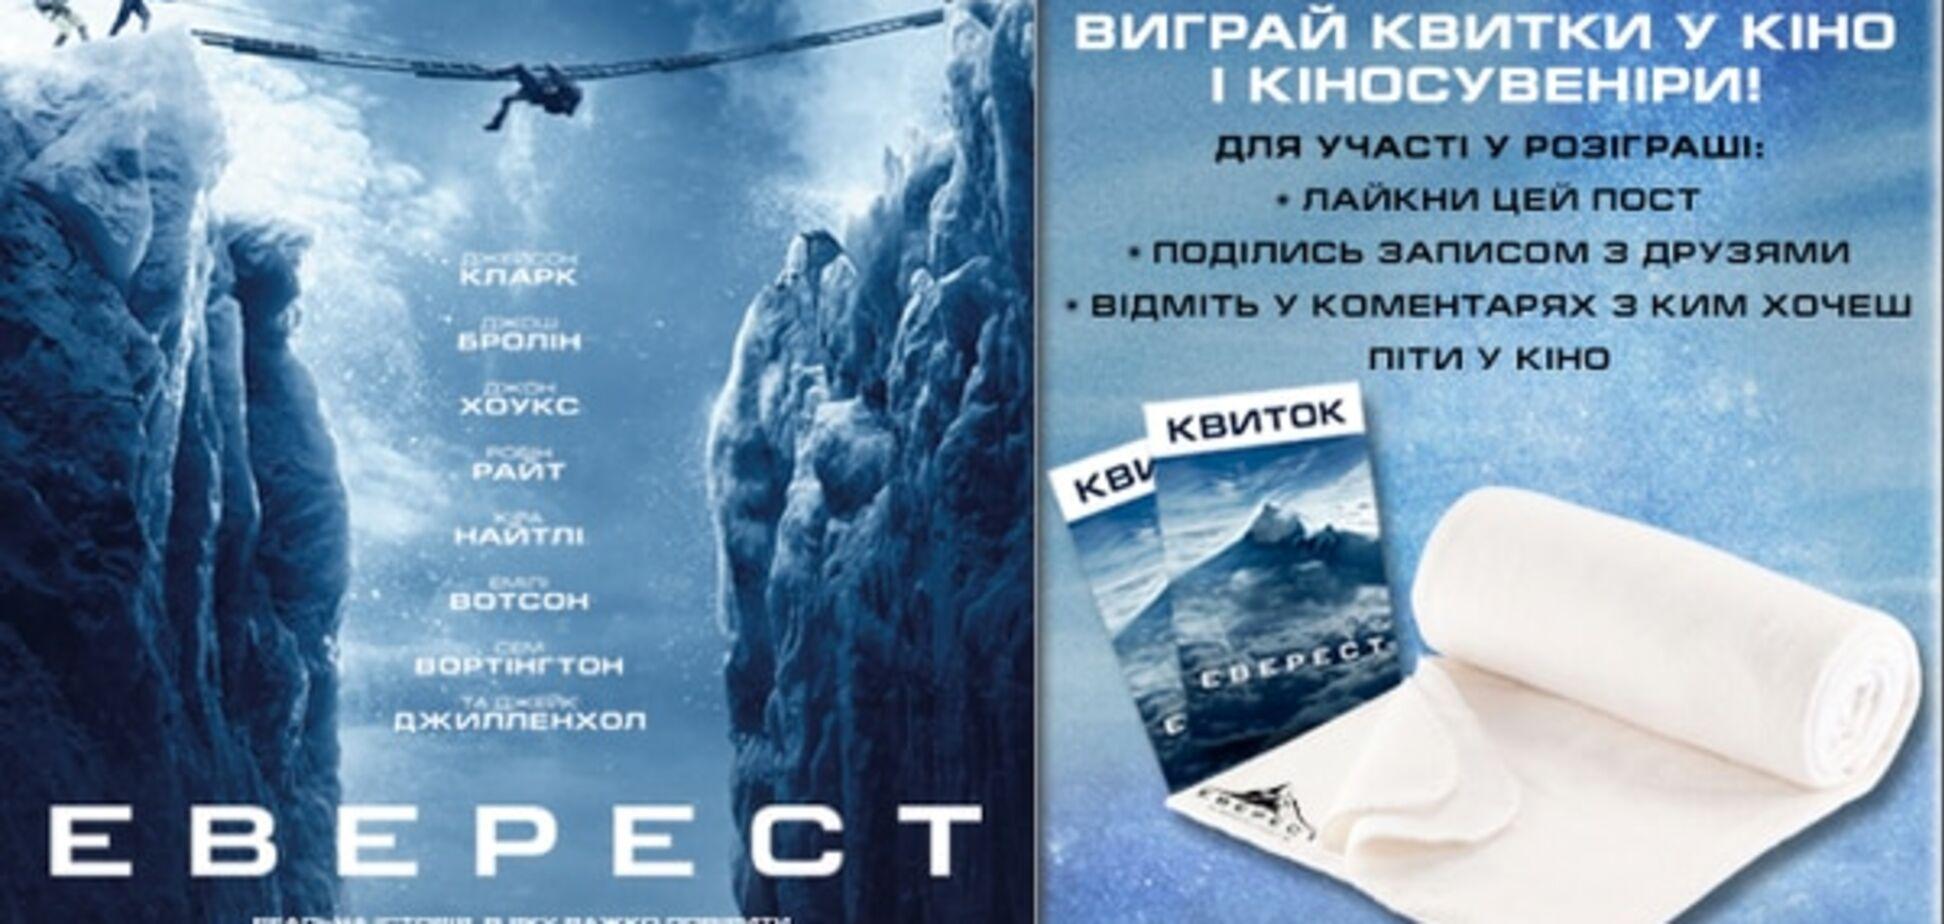 Бери участь в конкурсі та виграй квитки на фільм 'Еверест'